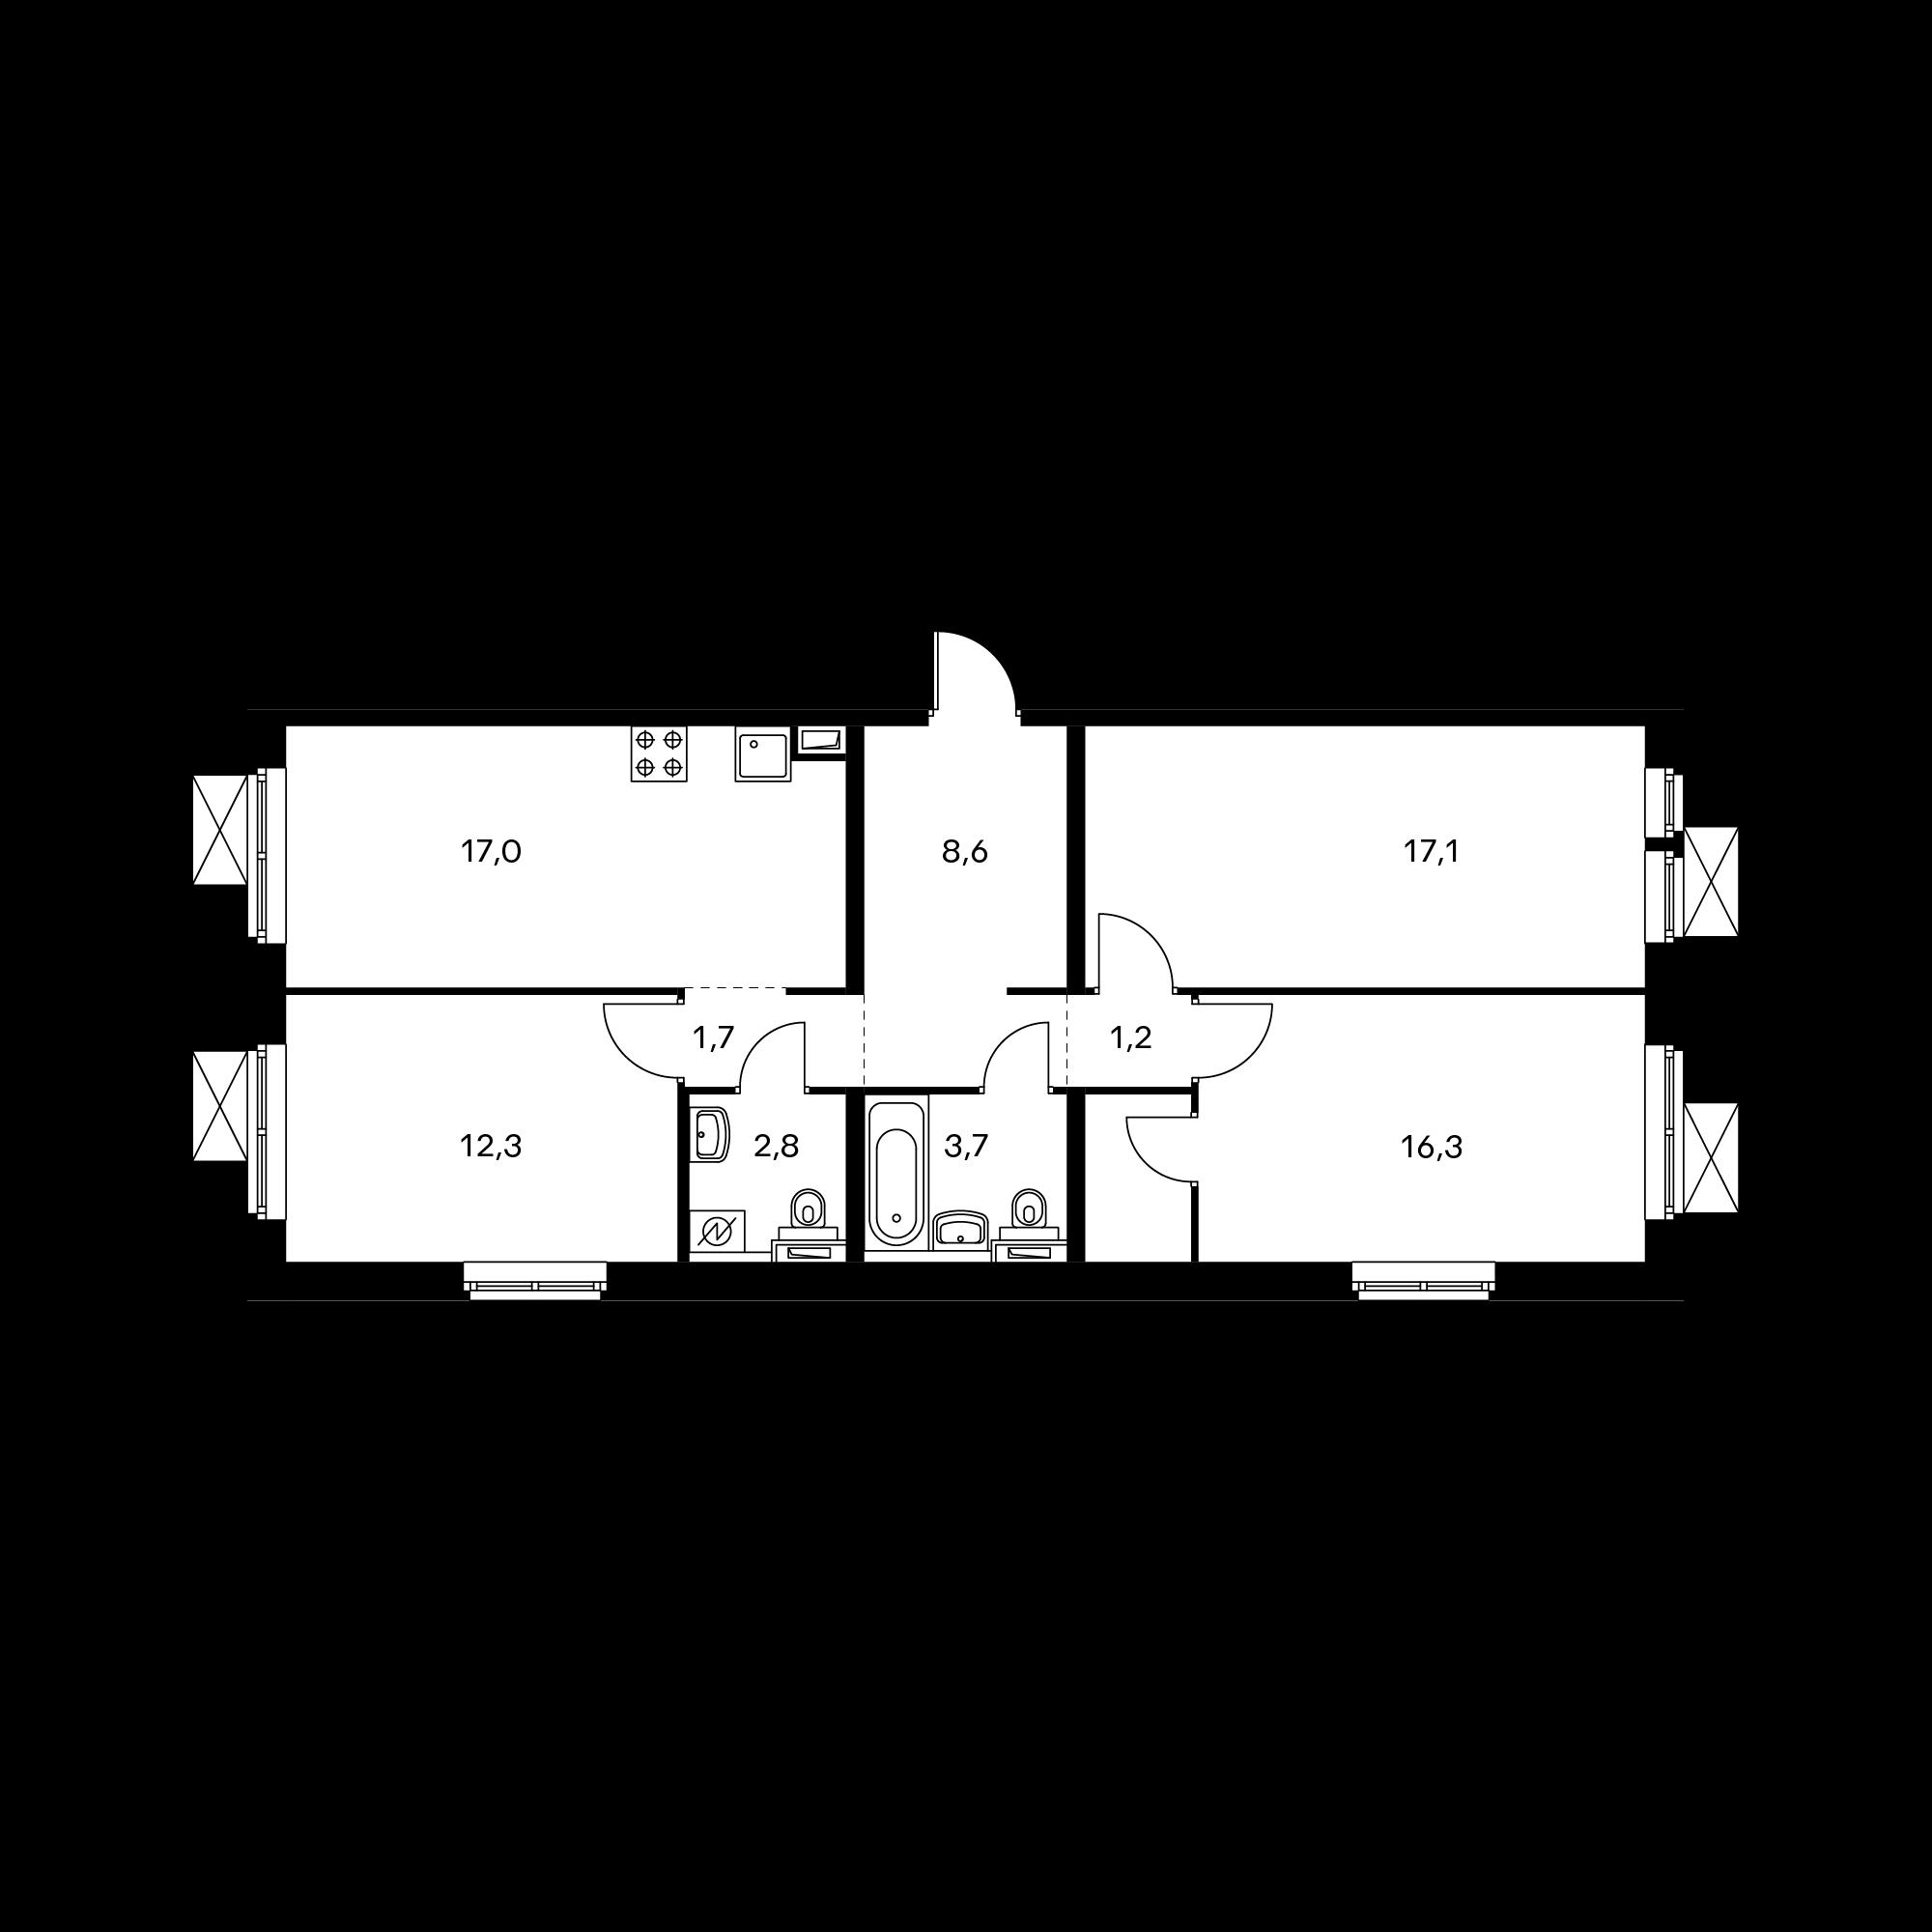 3KM16_6.0-4